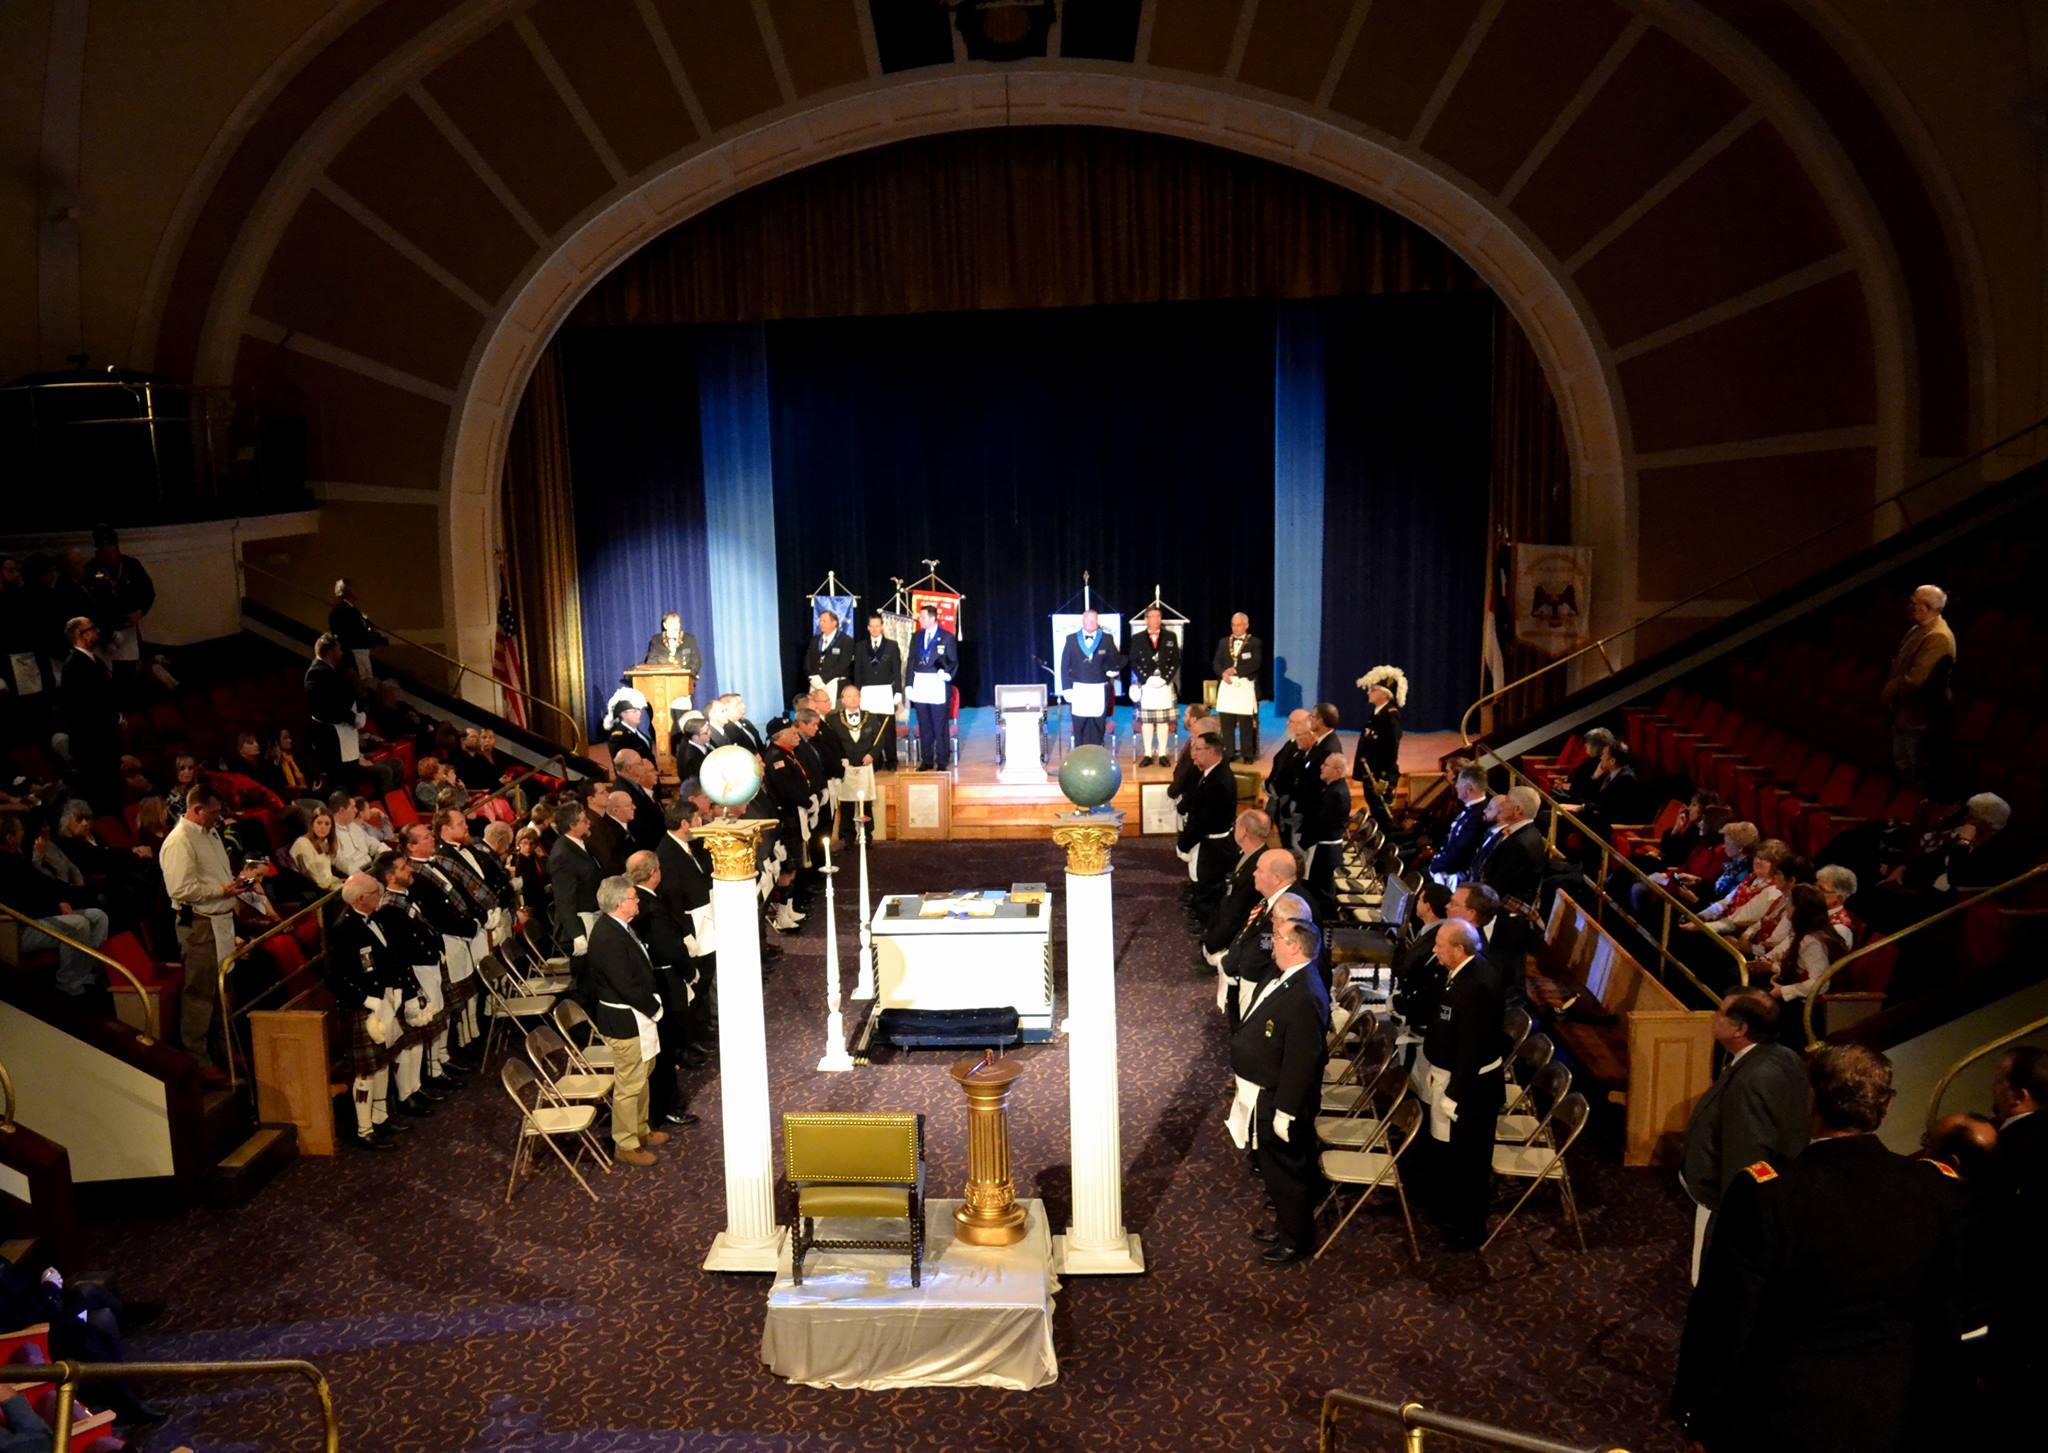 Denver.Consistory.Auditorium.Stage.Center..06112014.jpg